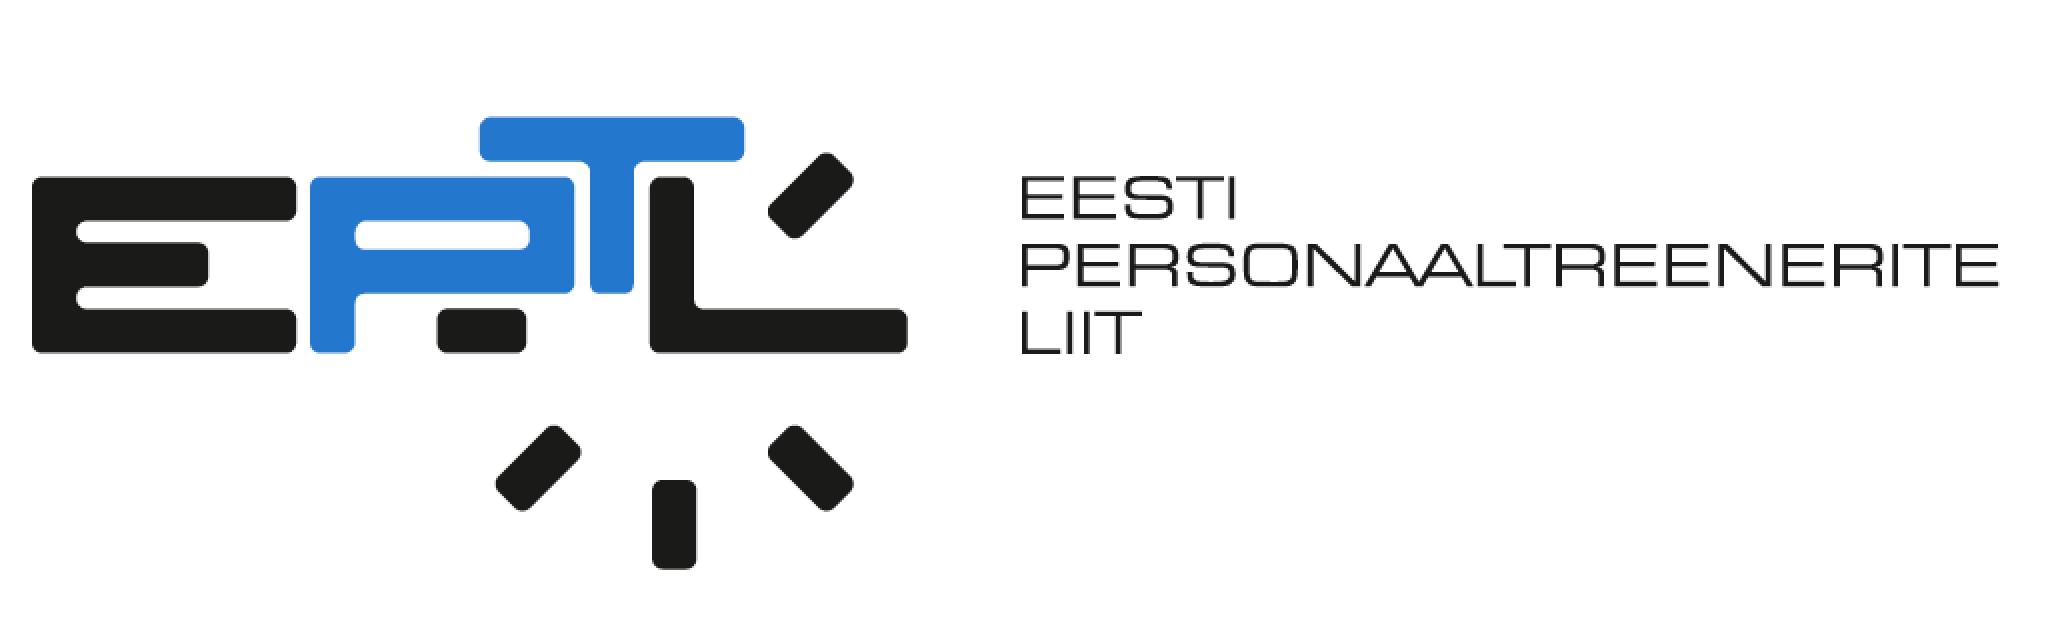 Eesti Personaaltreenerite Liit